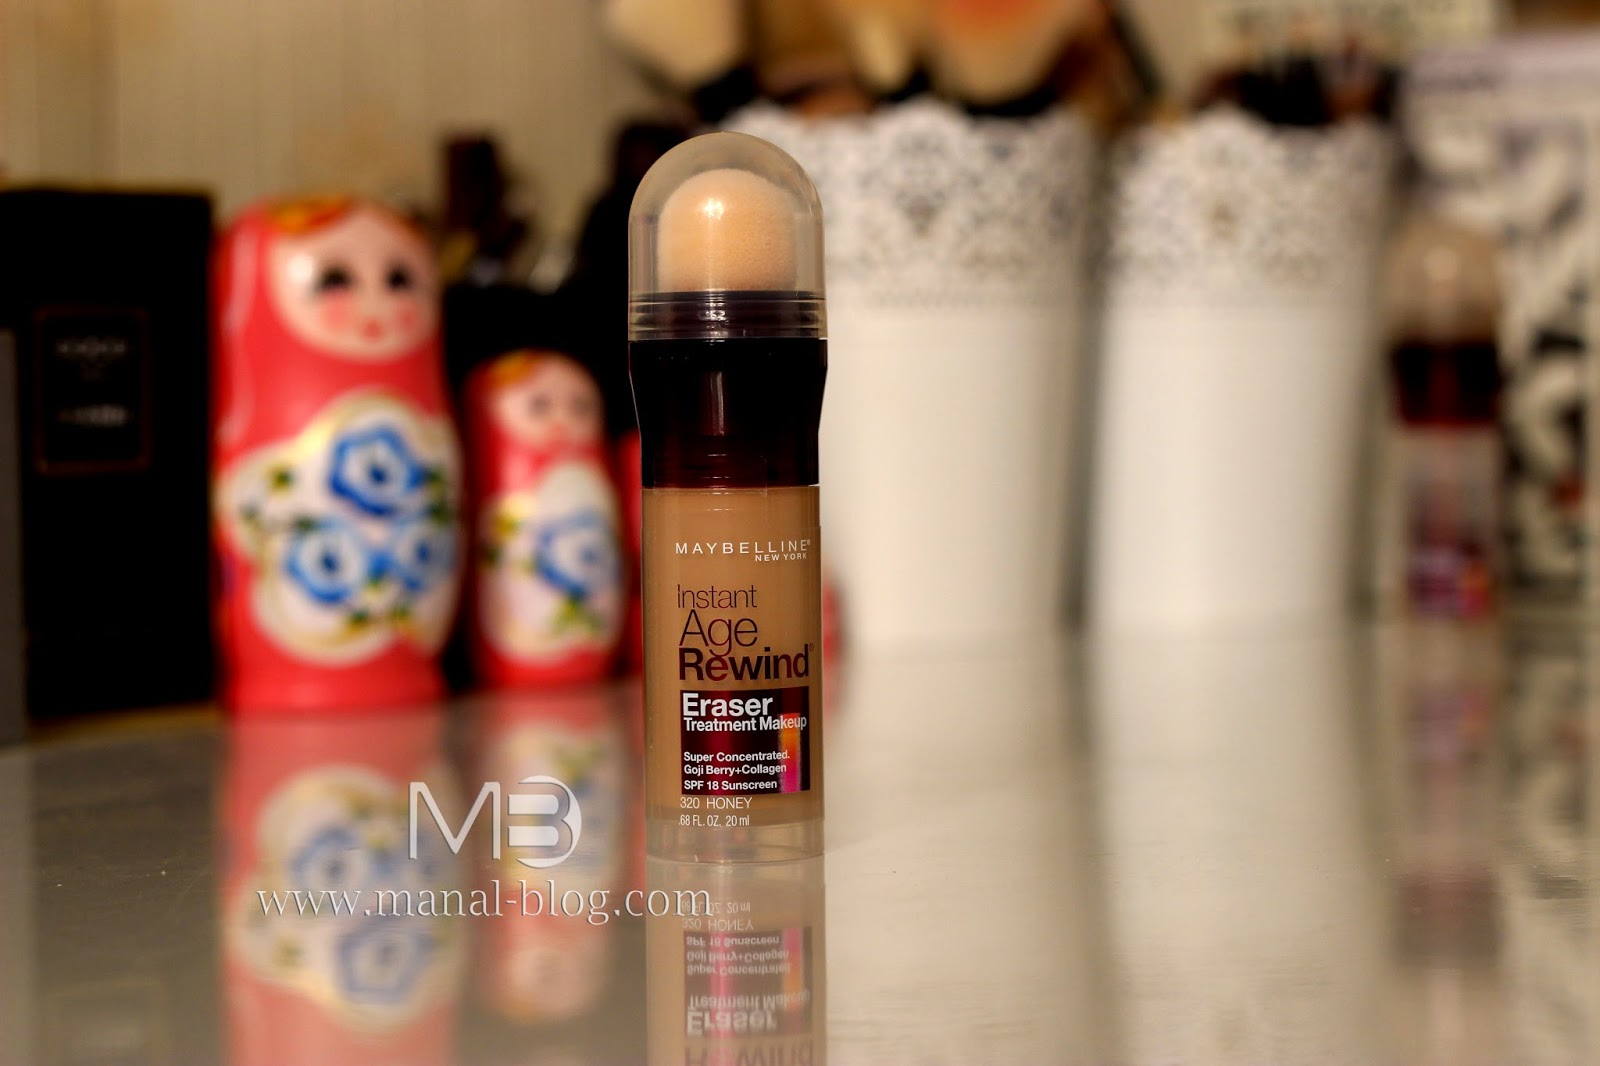 مدونة منال: Maybelline Instant Age Rewind Eraser Treatment Makeup